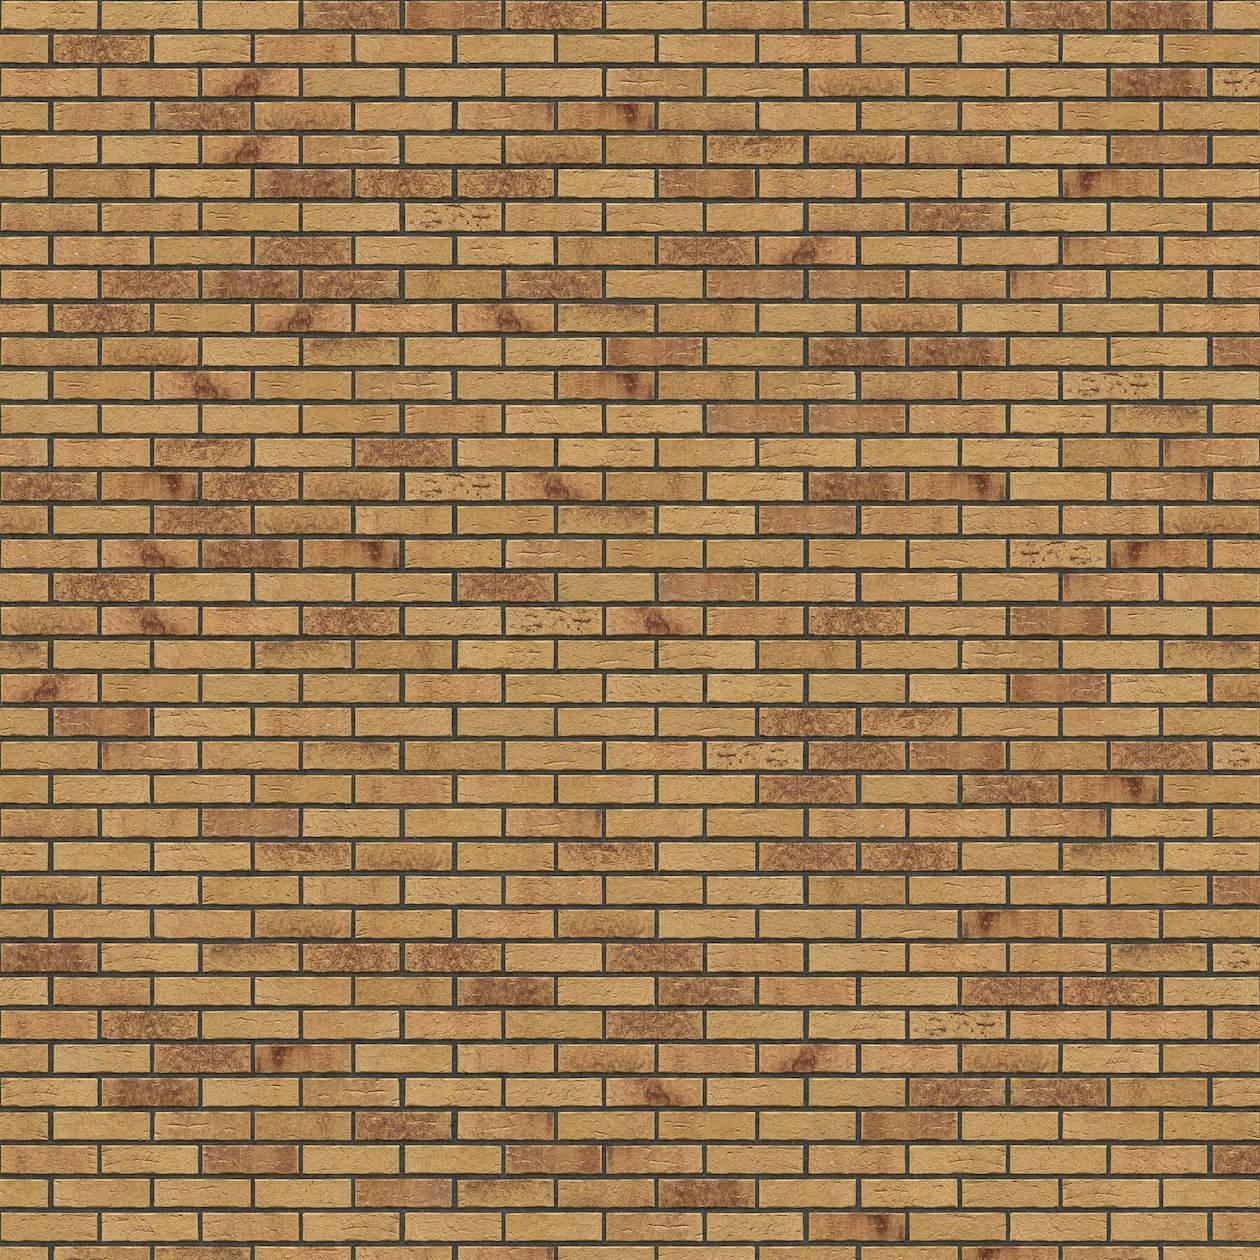 Puna-cigla-FeldHaus-Klinker-brick-house-nf-k-688-Antracit Fuga